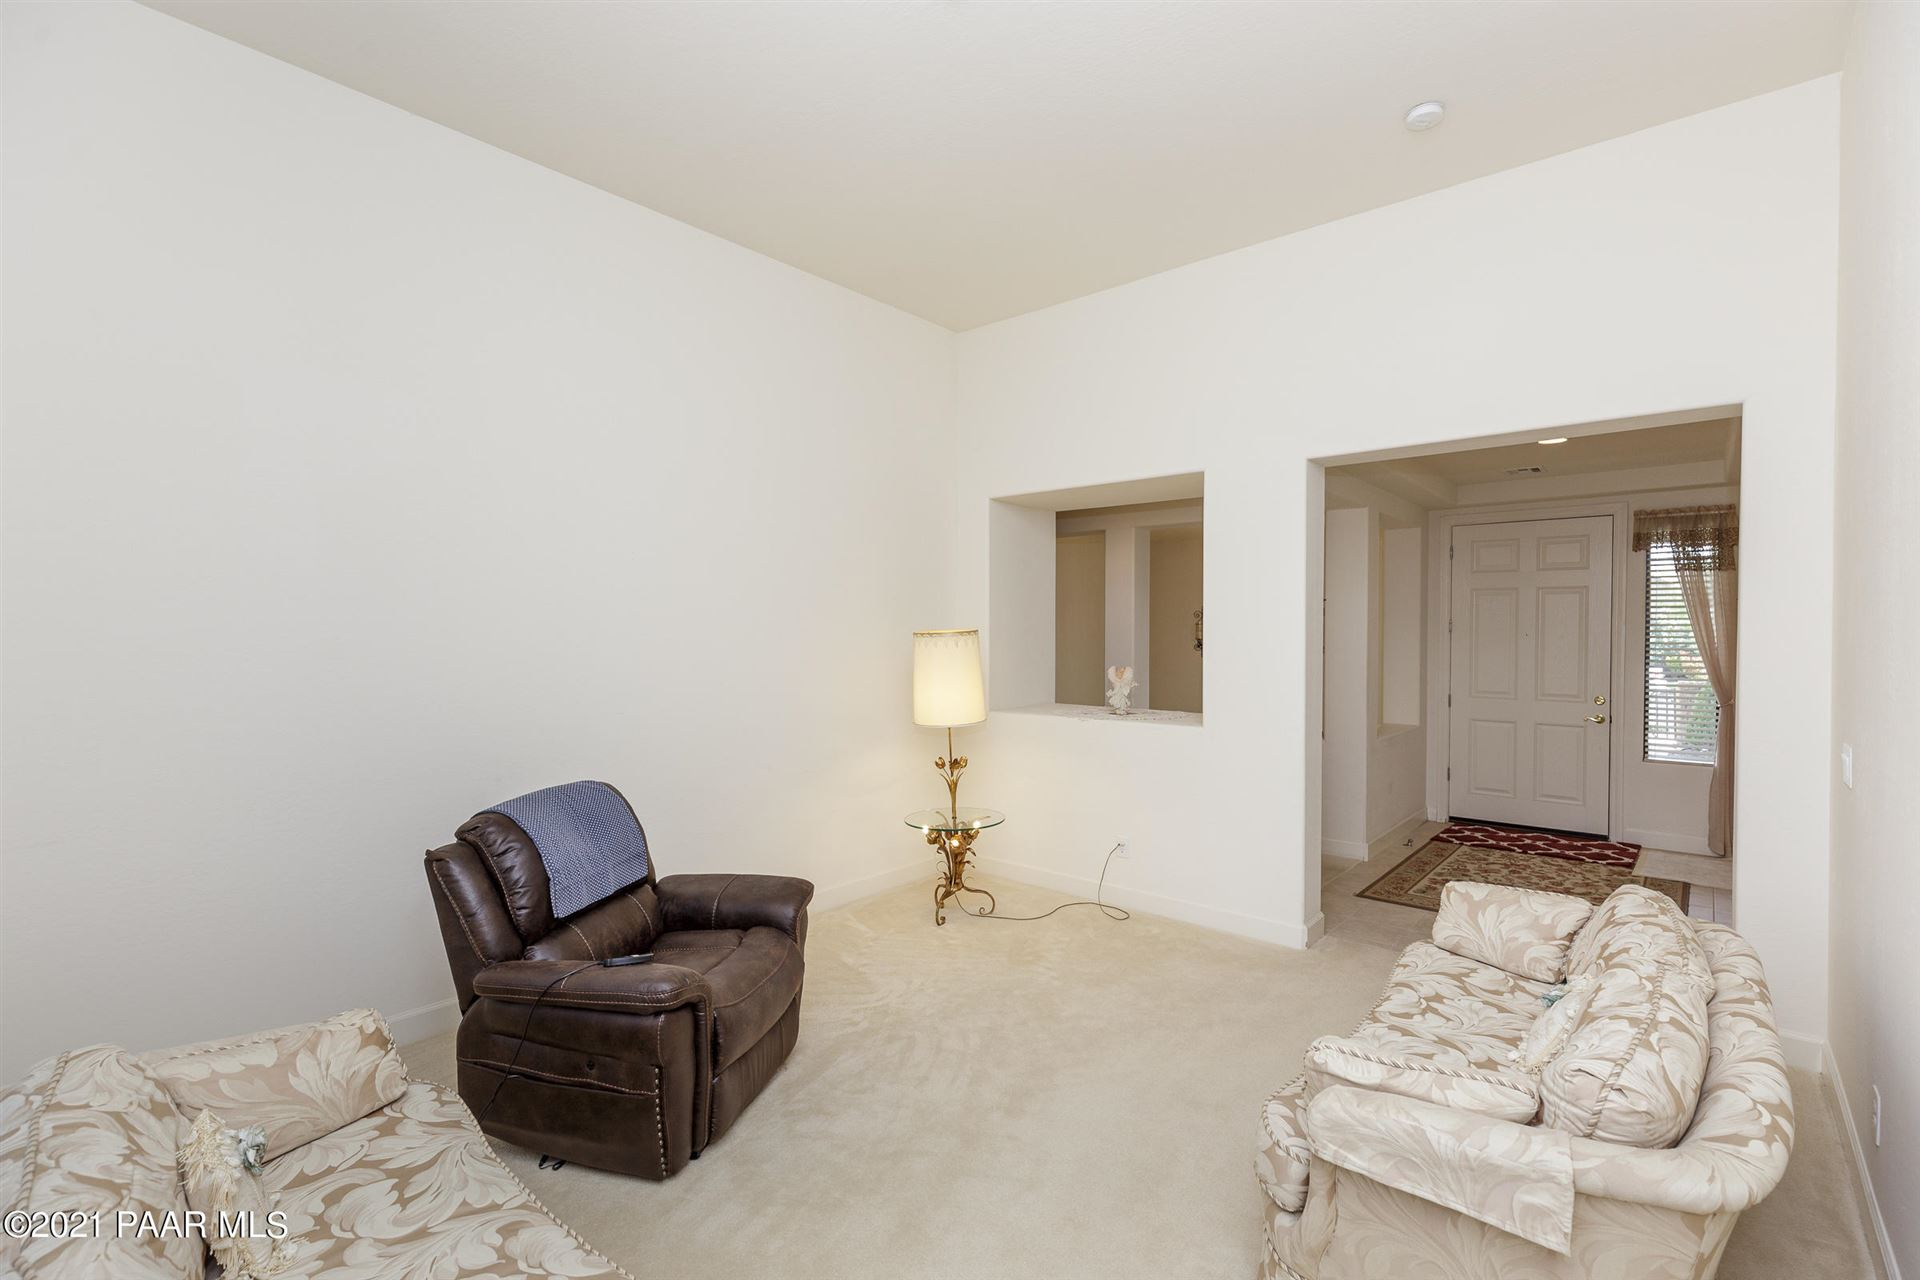 Photo of 1344 Sabatina Street #Lot: 76, Prescott, AZ 86301 (MLS # 1037659)